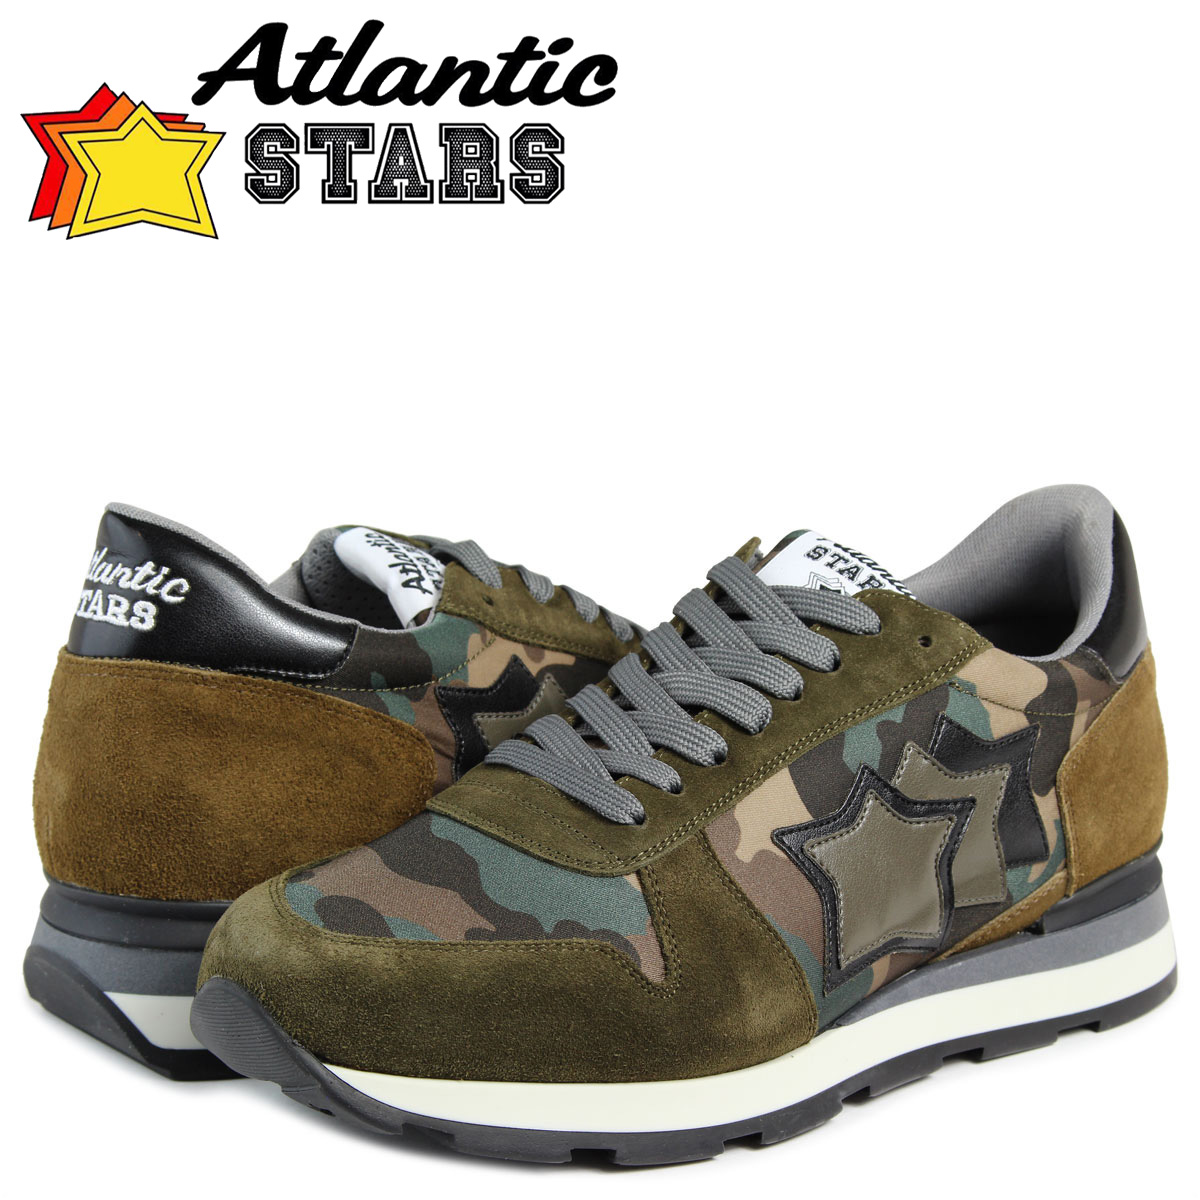 Atlantic STARS メンズ スニーカー アトランティックスターズ シリウス SIRIUS TH-81N 靴 カモ